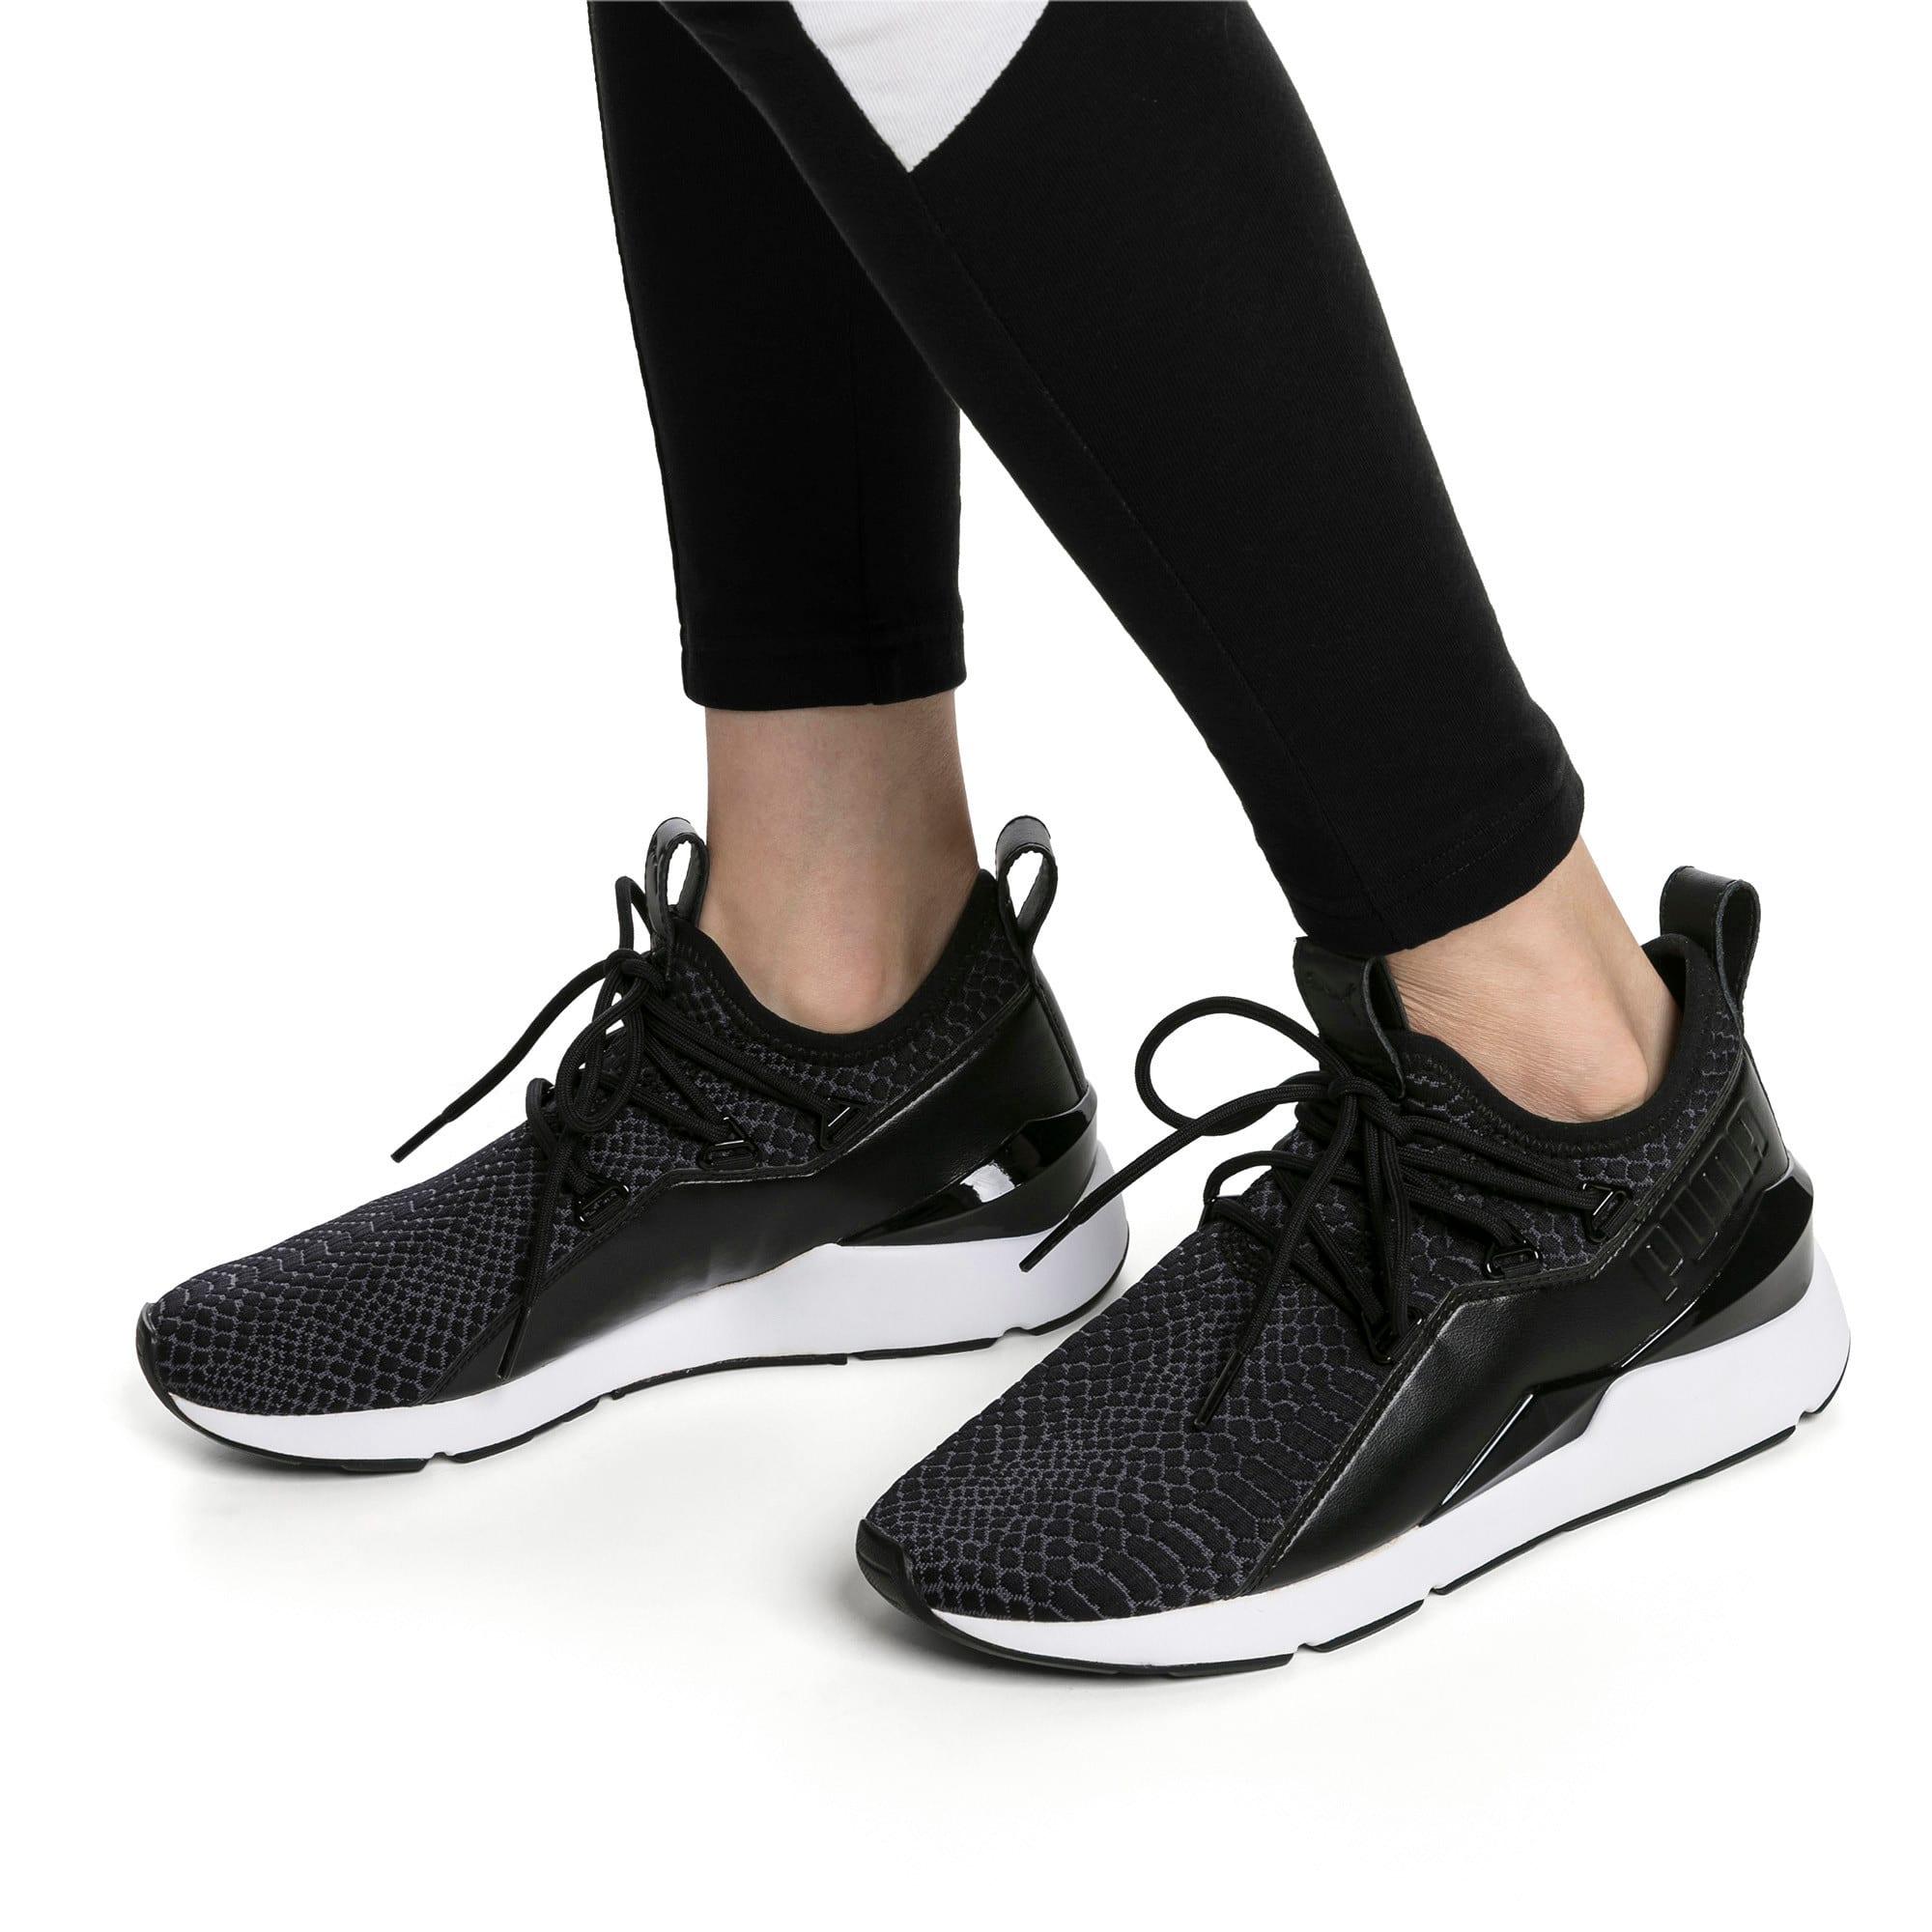 Thumbnail 2 of Muse 2 Reptile Trailblazer Women's Sneakers, Puma Black, medium